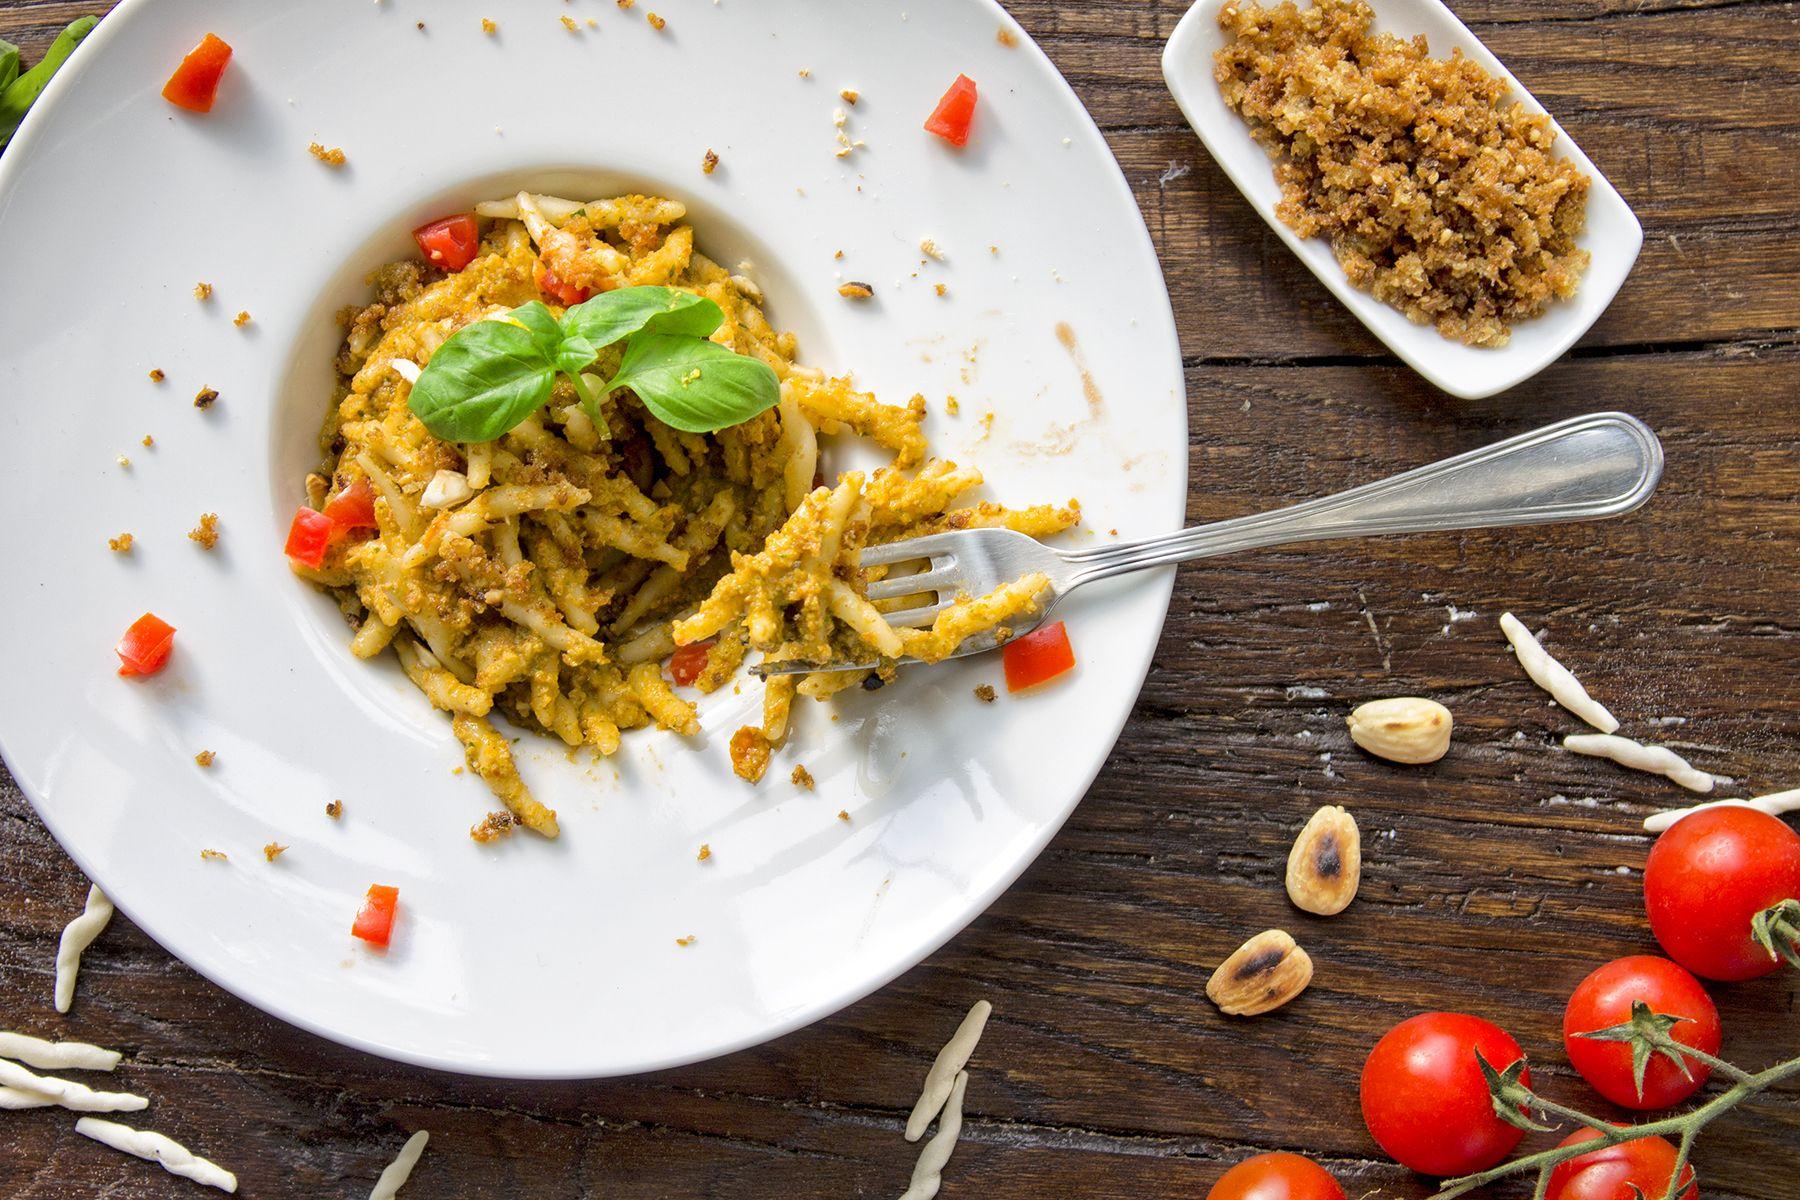 pesto-di-mandorle-e-trofie-pasta-contemporaneo-food